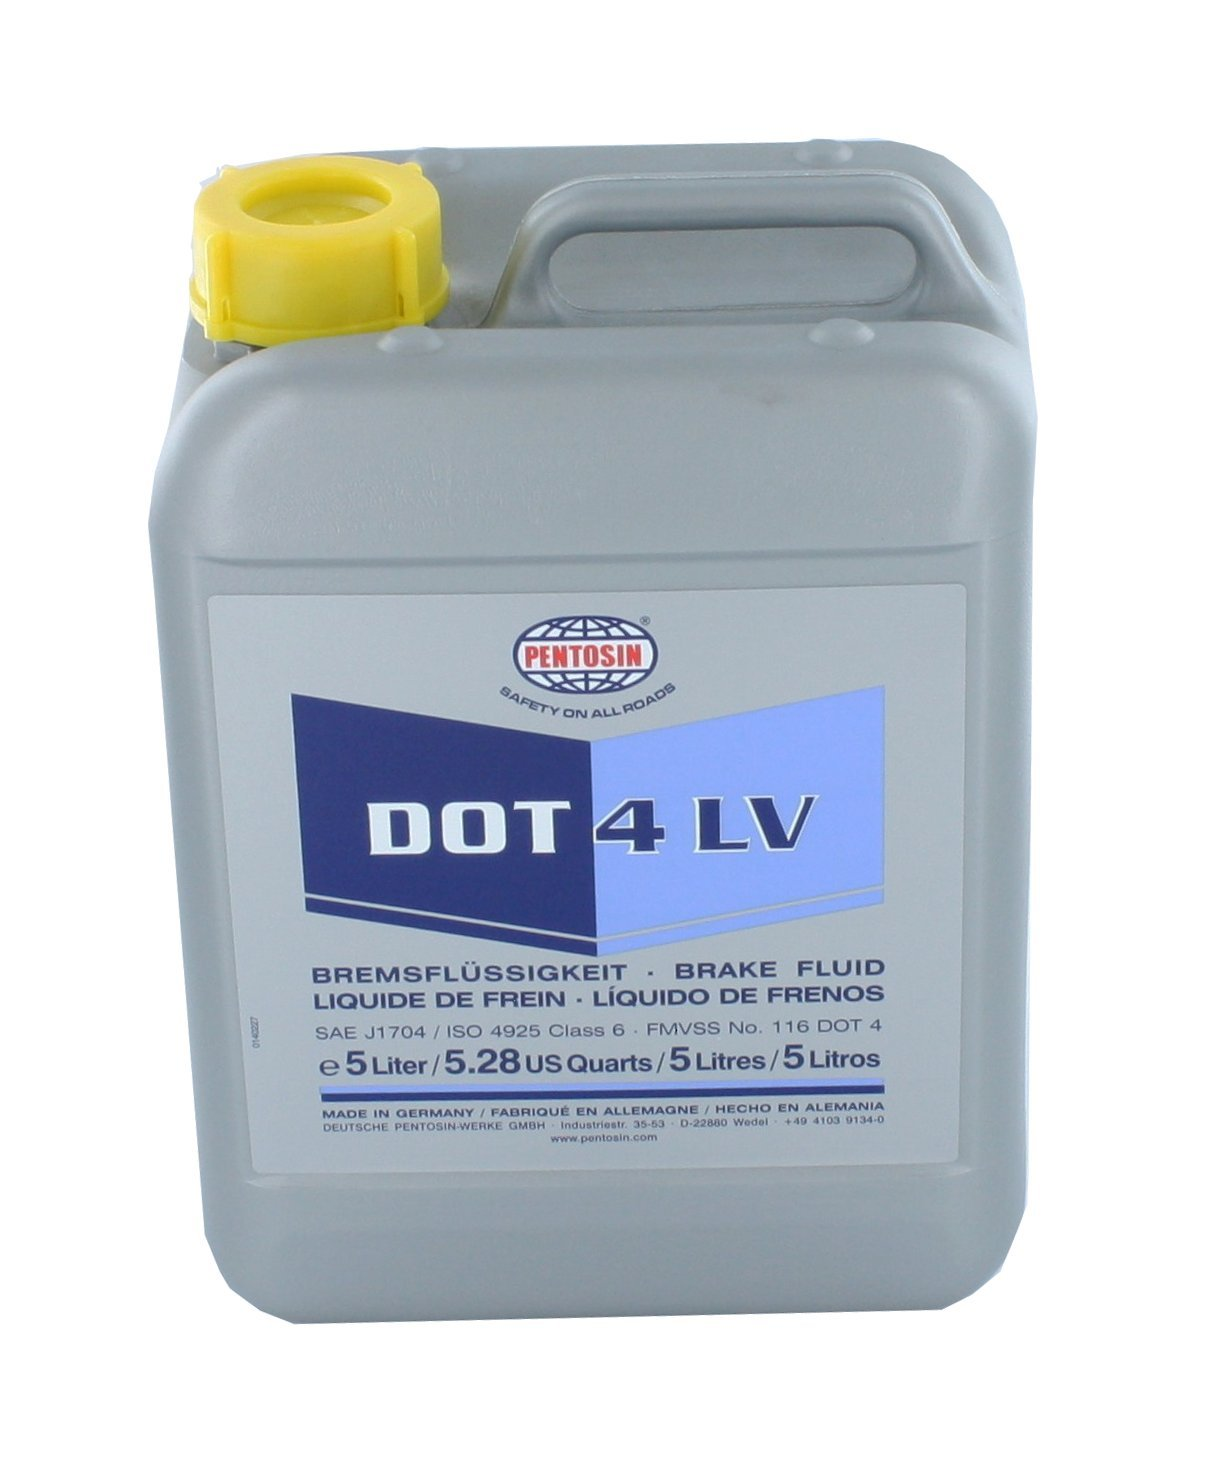 Pentosin 1224204-C Dot 4 LV Brake Fluid, 5 Liter (Case of 4) by CRP Automotive